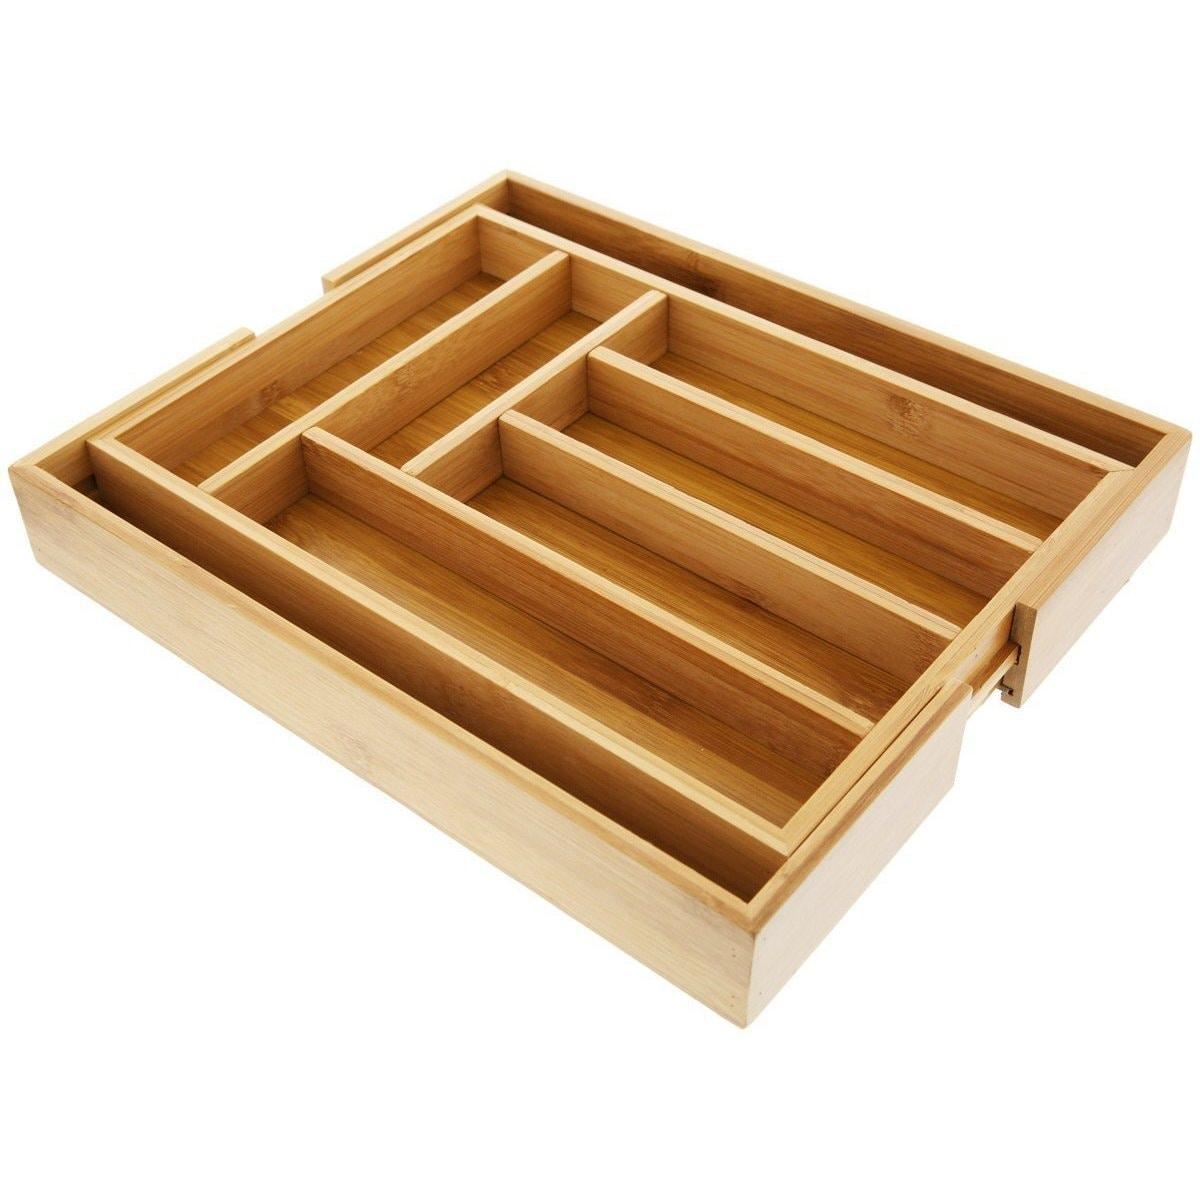 Concept Organic Bamboo Expandable 6-8 Slots Organizer / C...